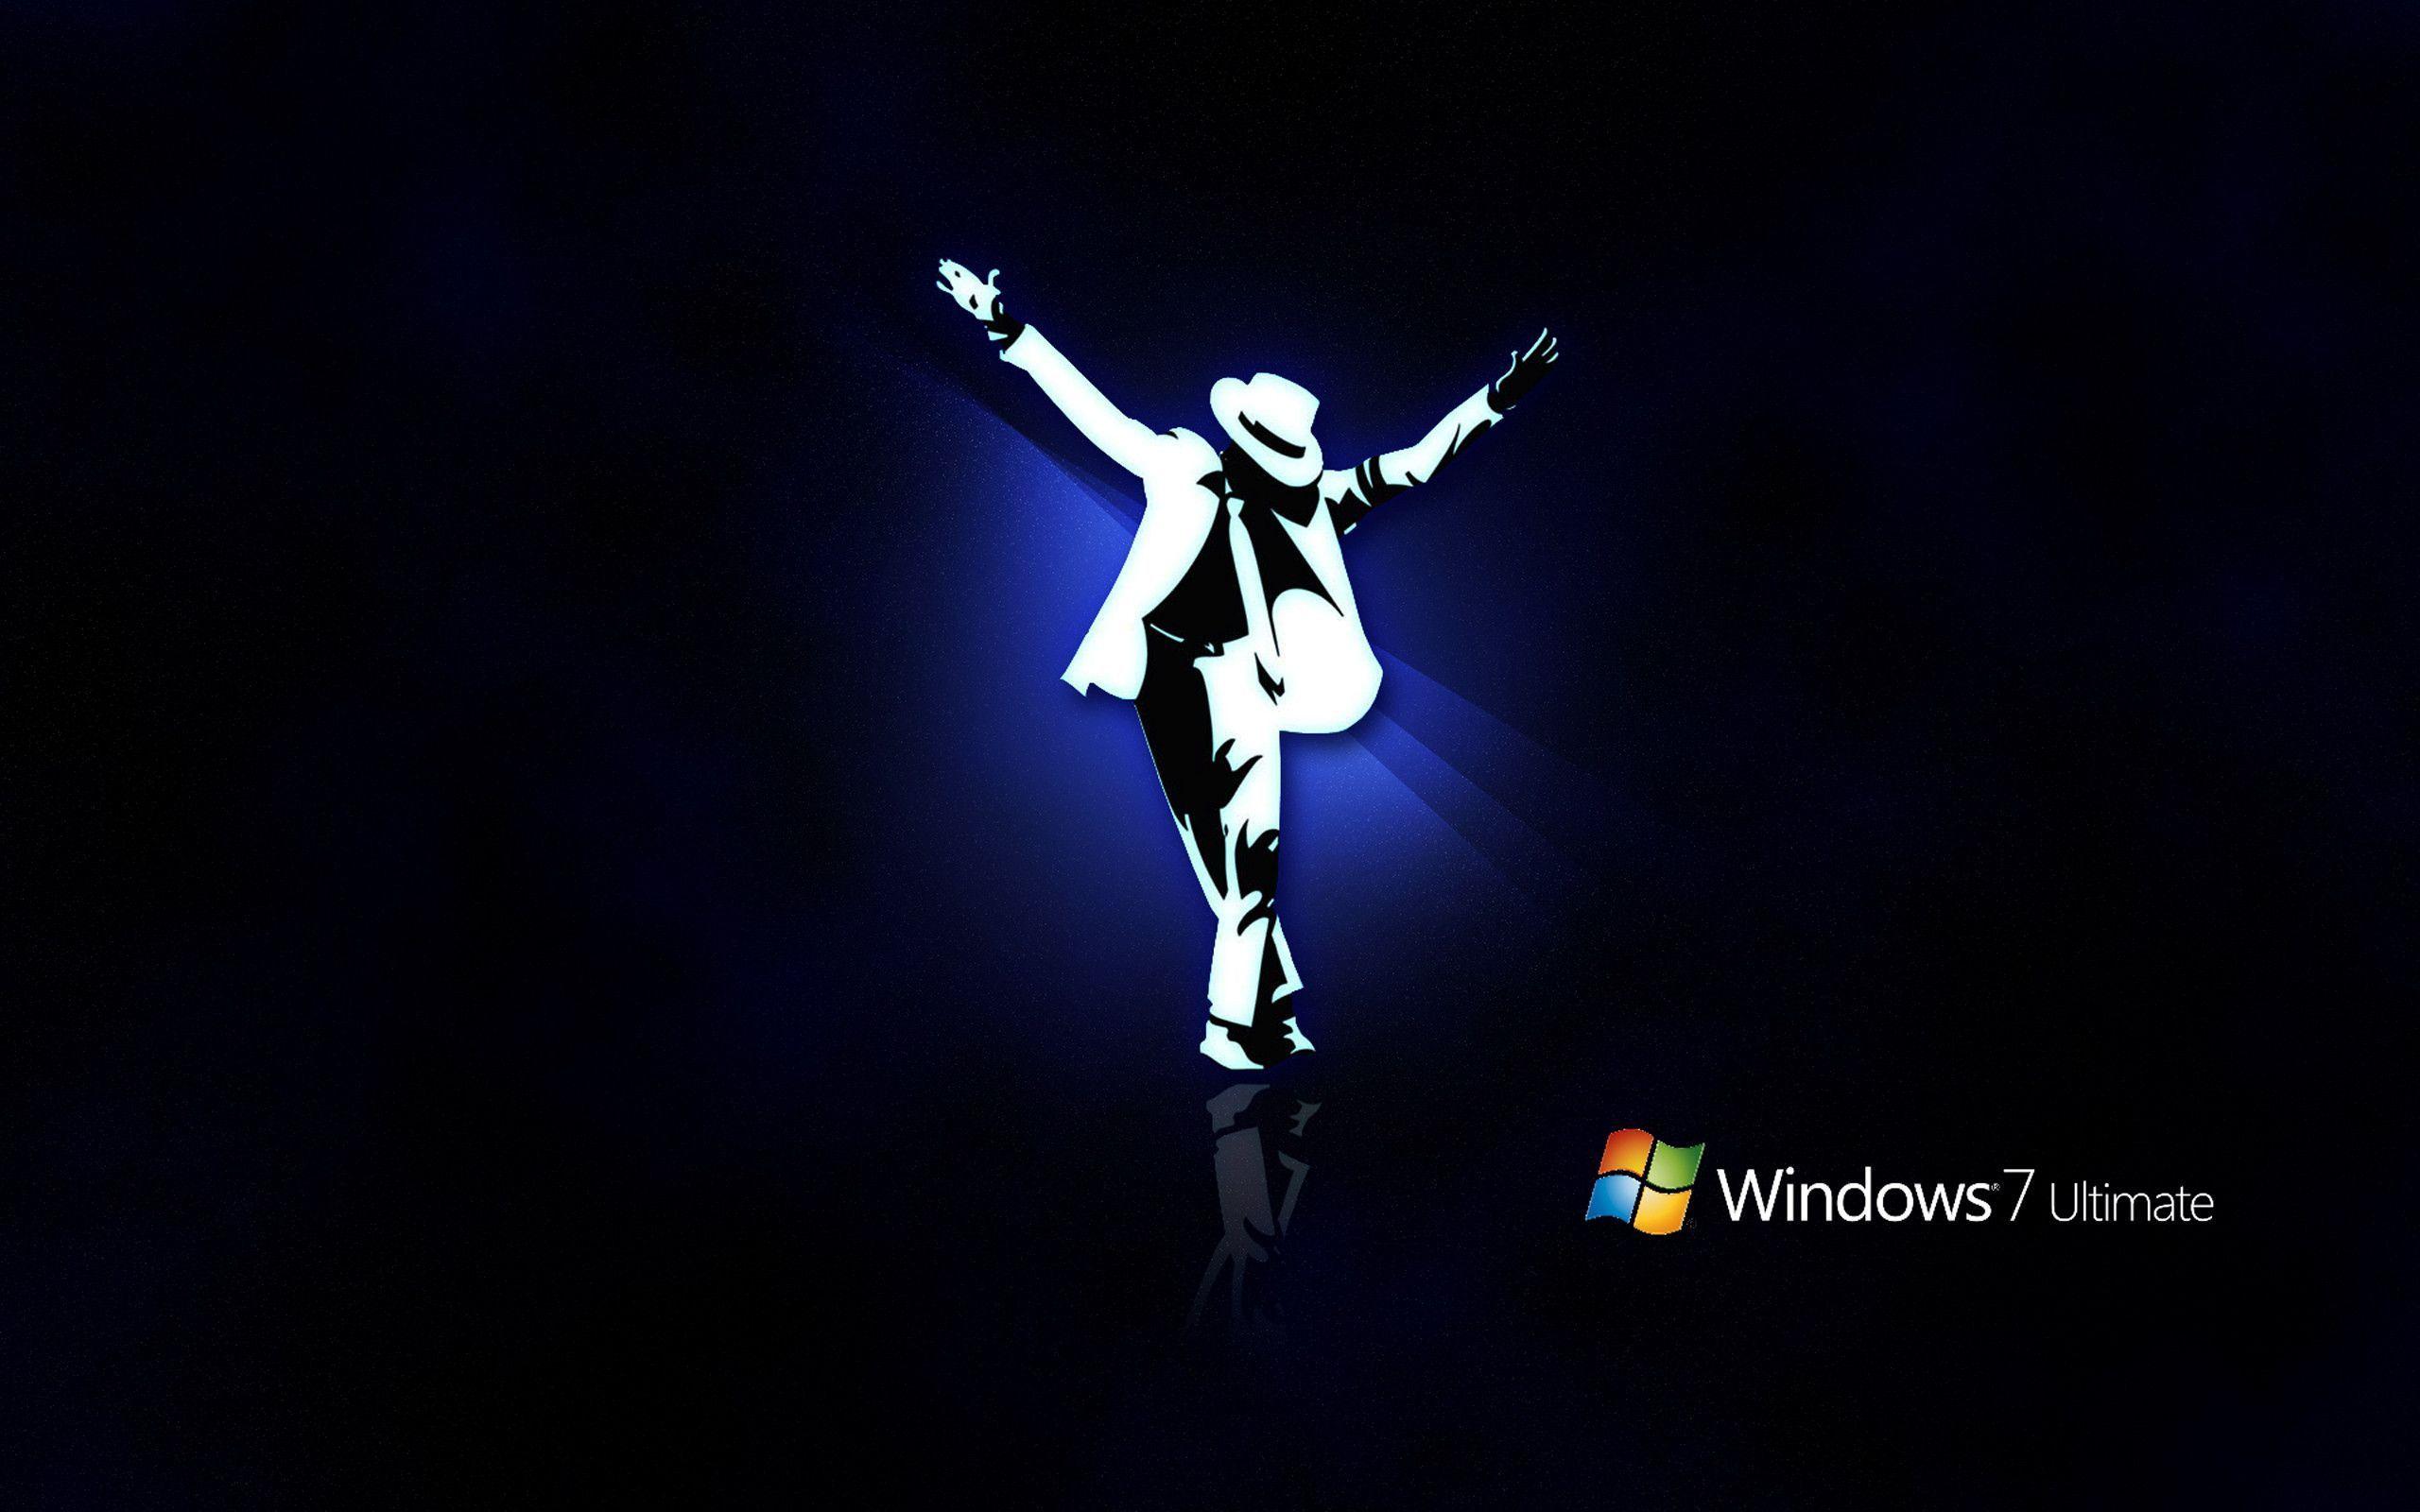 d desktop wallpaper for windows  SF